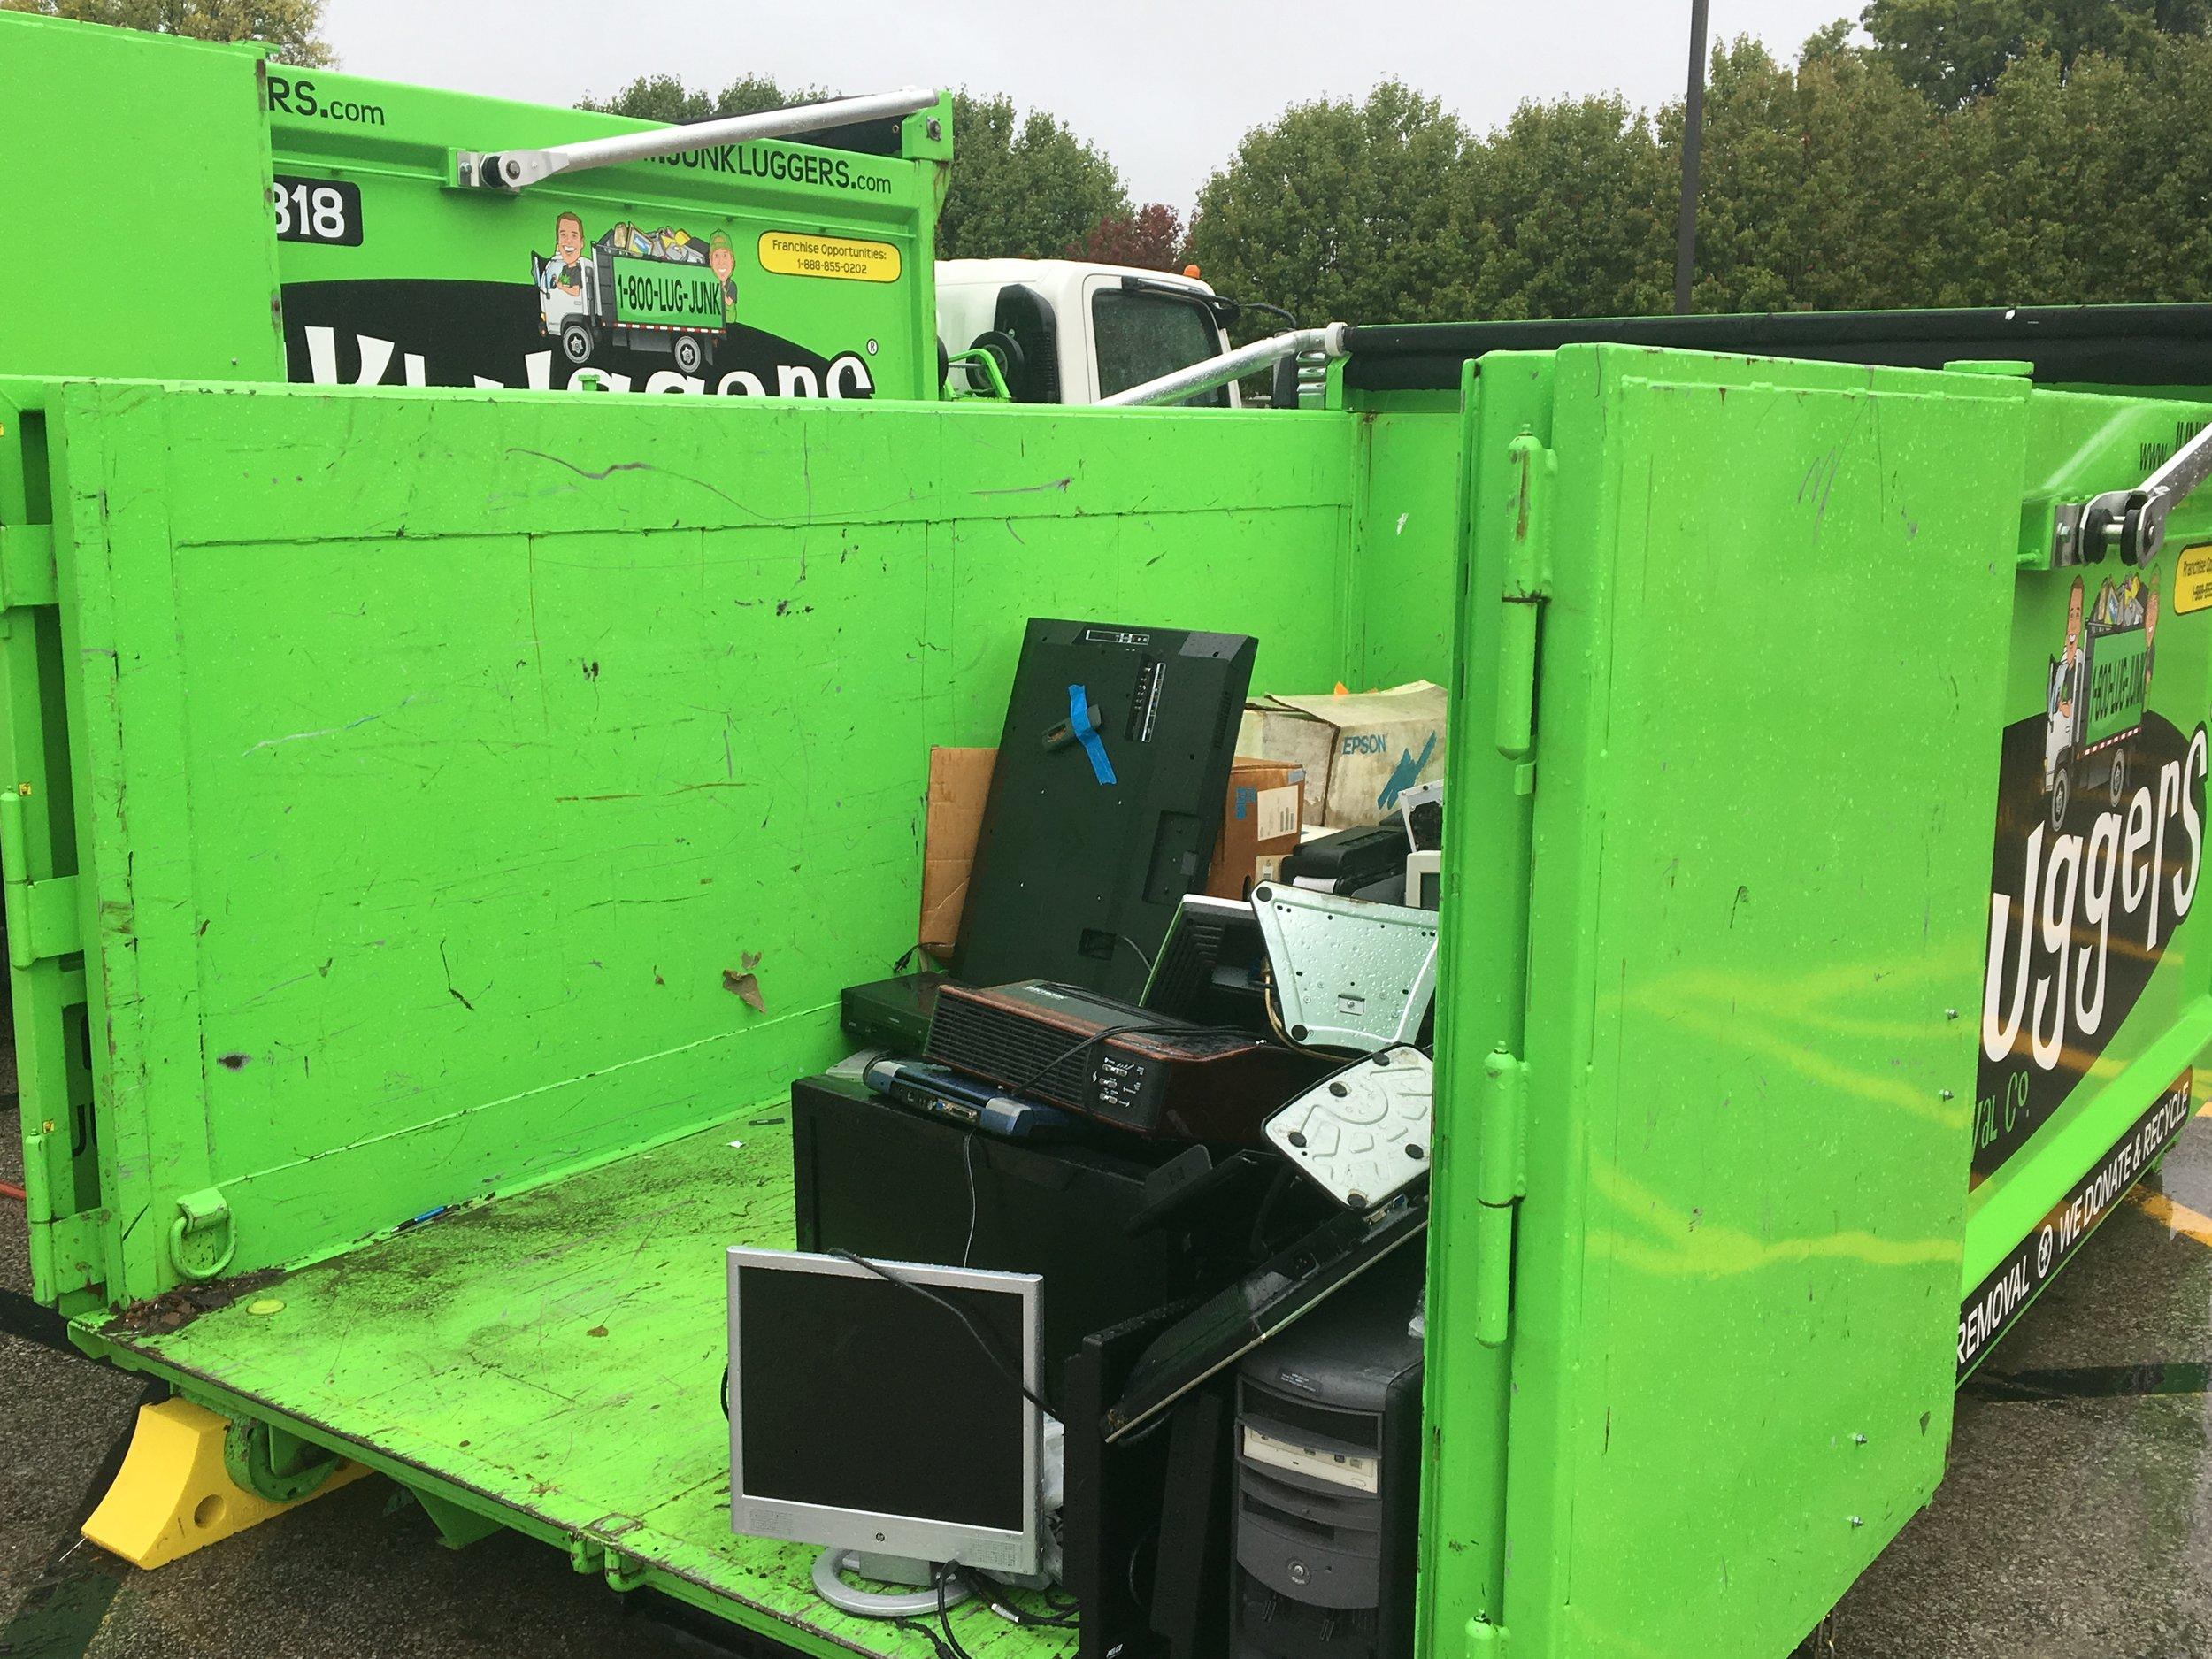 RecycleEvent1_10062018.jpg